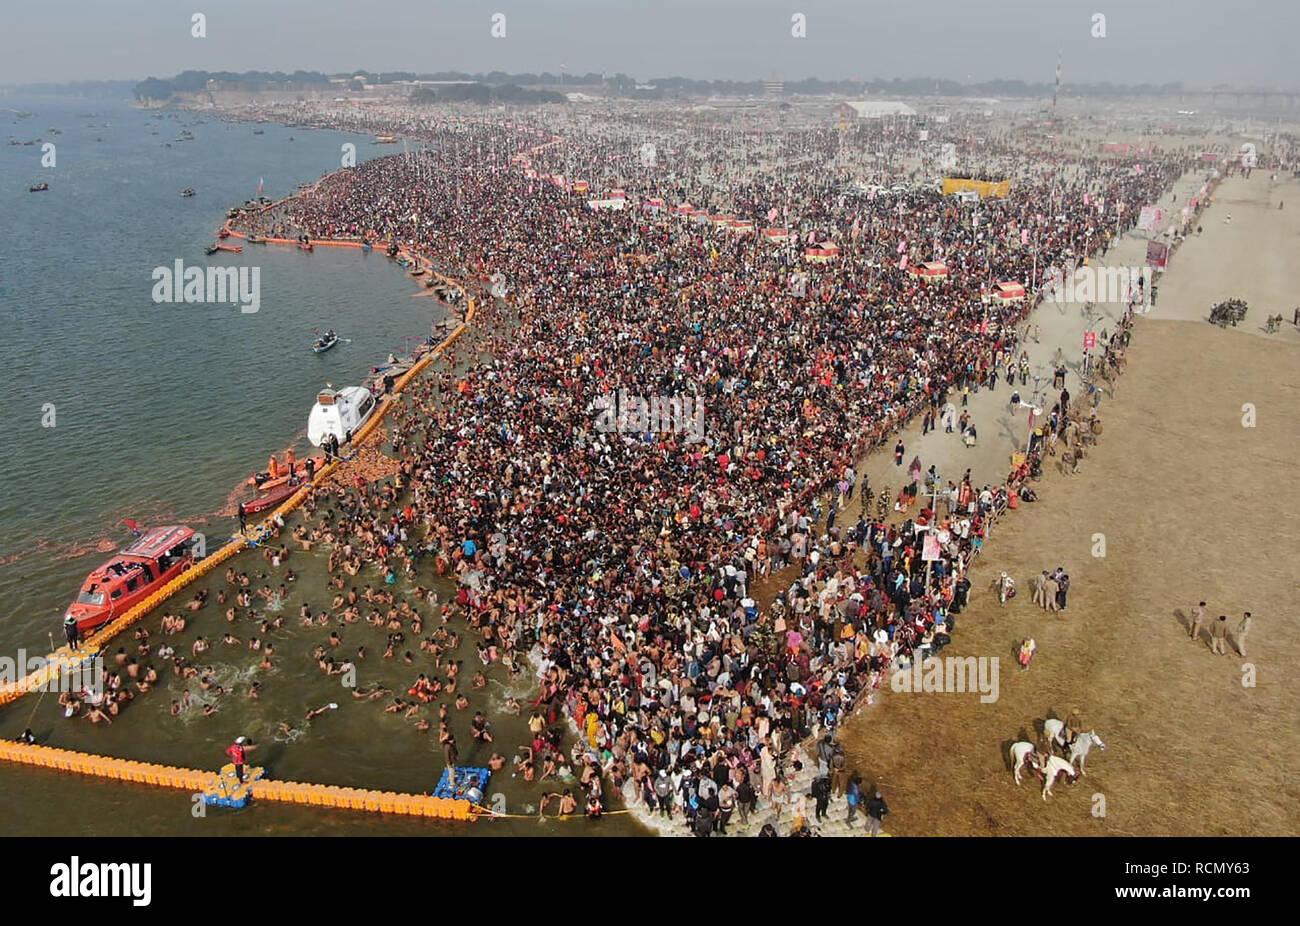 Allahabad, Uttar Pradesh, India. 15 Enero, 2019. Allahabad: un mar de devotos reunidos para tomar baño en Sangam en ocasión de Makar Sankranti, el primer Shahi Snan, durante el Kumbh Mela 2019 en Allahabad (Prayagraj) Martes, 15 Jan, 2019. Crédito: Prabhat Kumar Verma/Zuma alambre/Alamy Live News Foto de stock